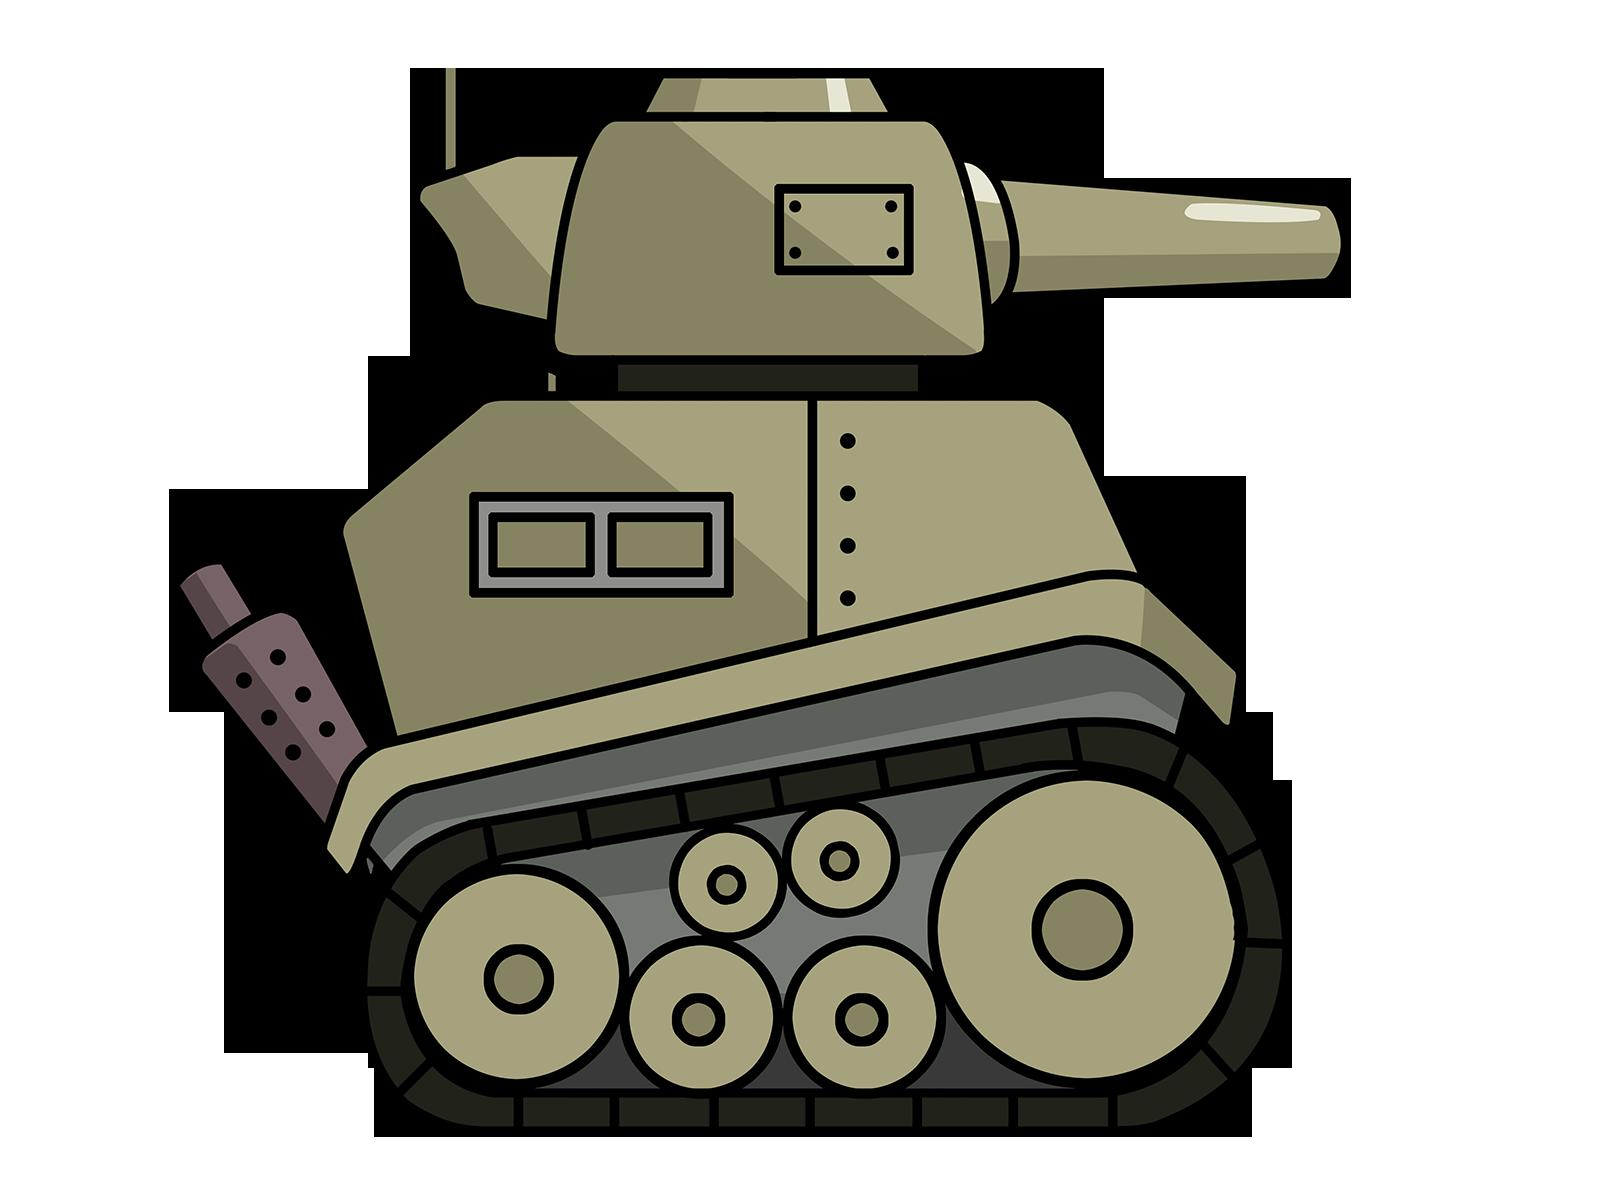 Army clipart war tank #7